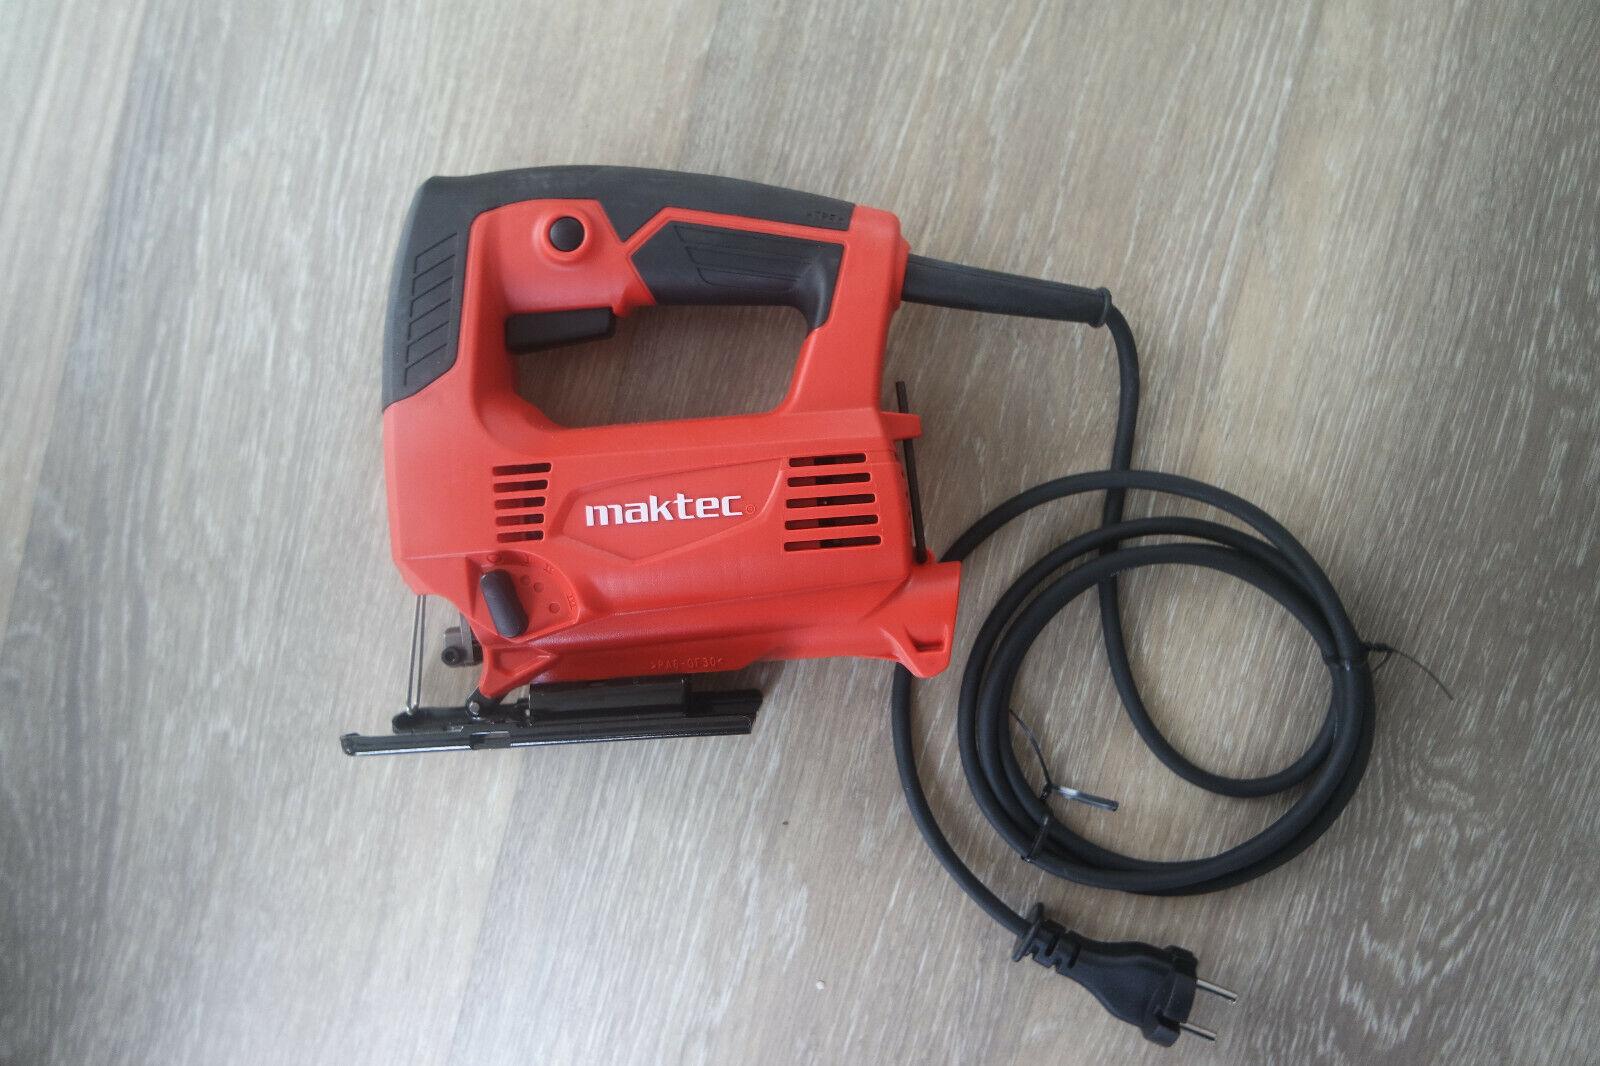 Makita Maktec MT431 Pendelhub Stichsäge 450 Watt